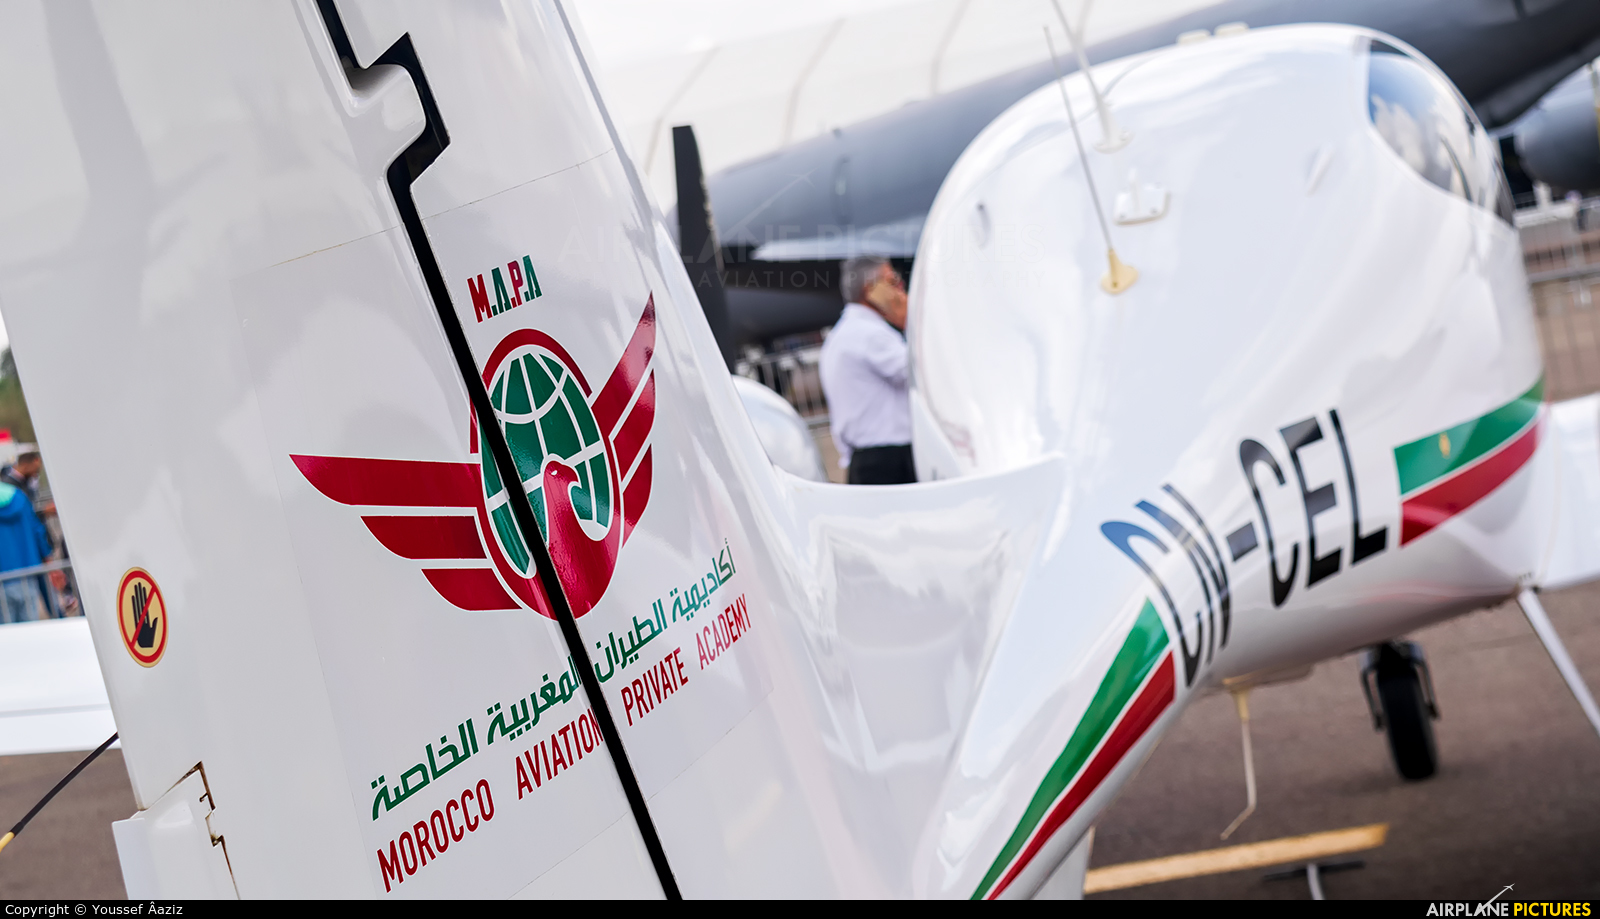 Morocco Aviation Private Academy (MAPA) CN-CEL aircraft at Marrakech - Menara